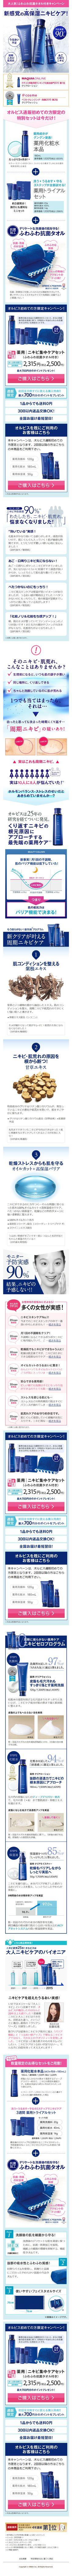 http://pr.orbis.co.jp/cosmetics/clear/158/?adid=line_92&sns=line&pcd=20000636&plnkcd=37097&pmcd=j18&pmsegcd=26&pagtcd=9&pcdflg=1